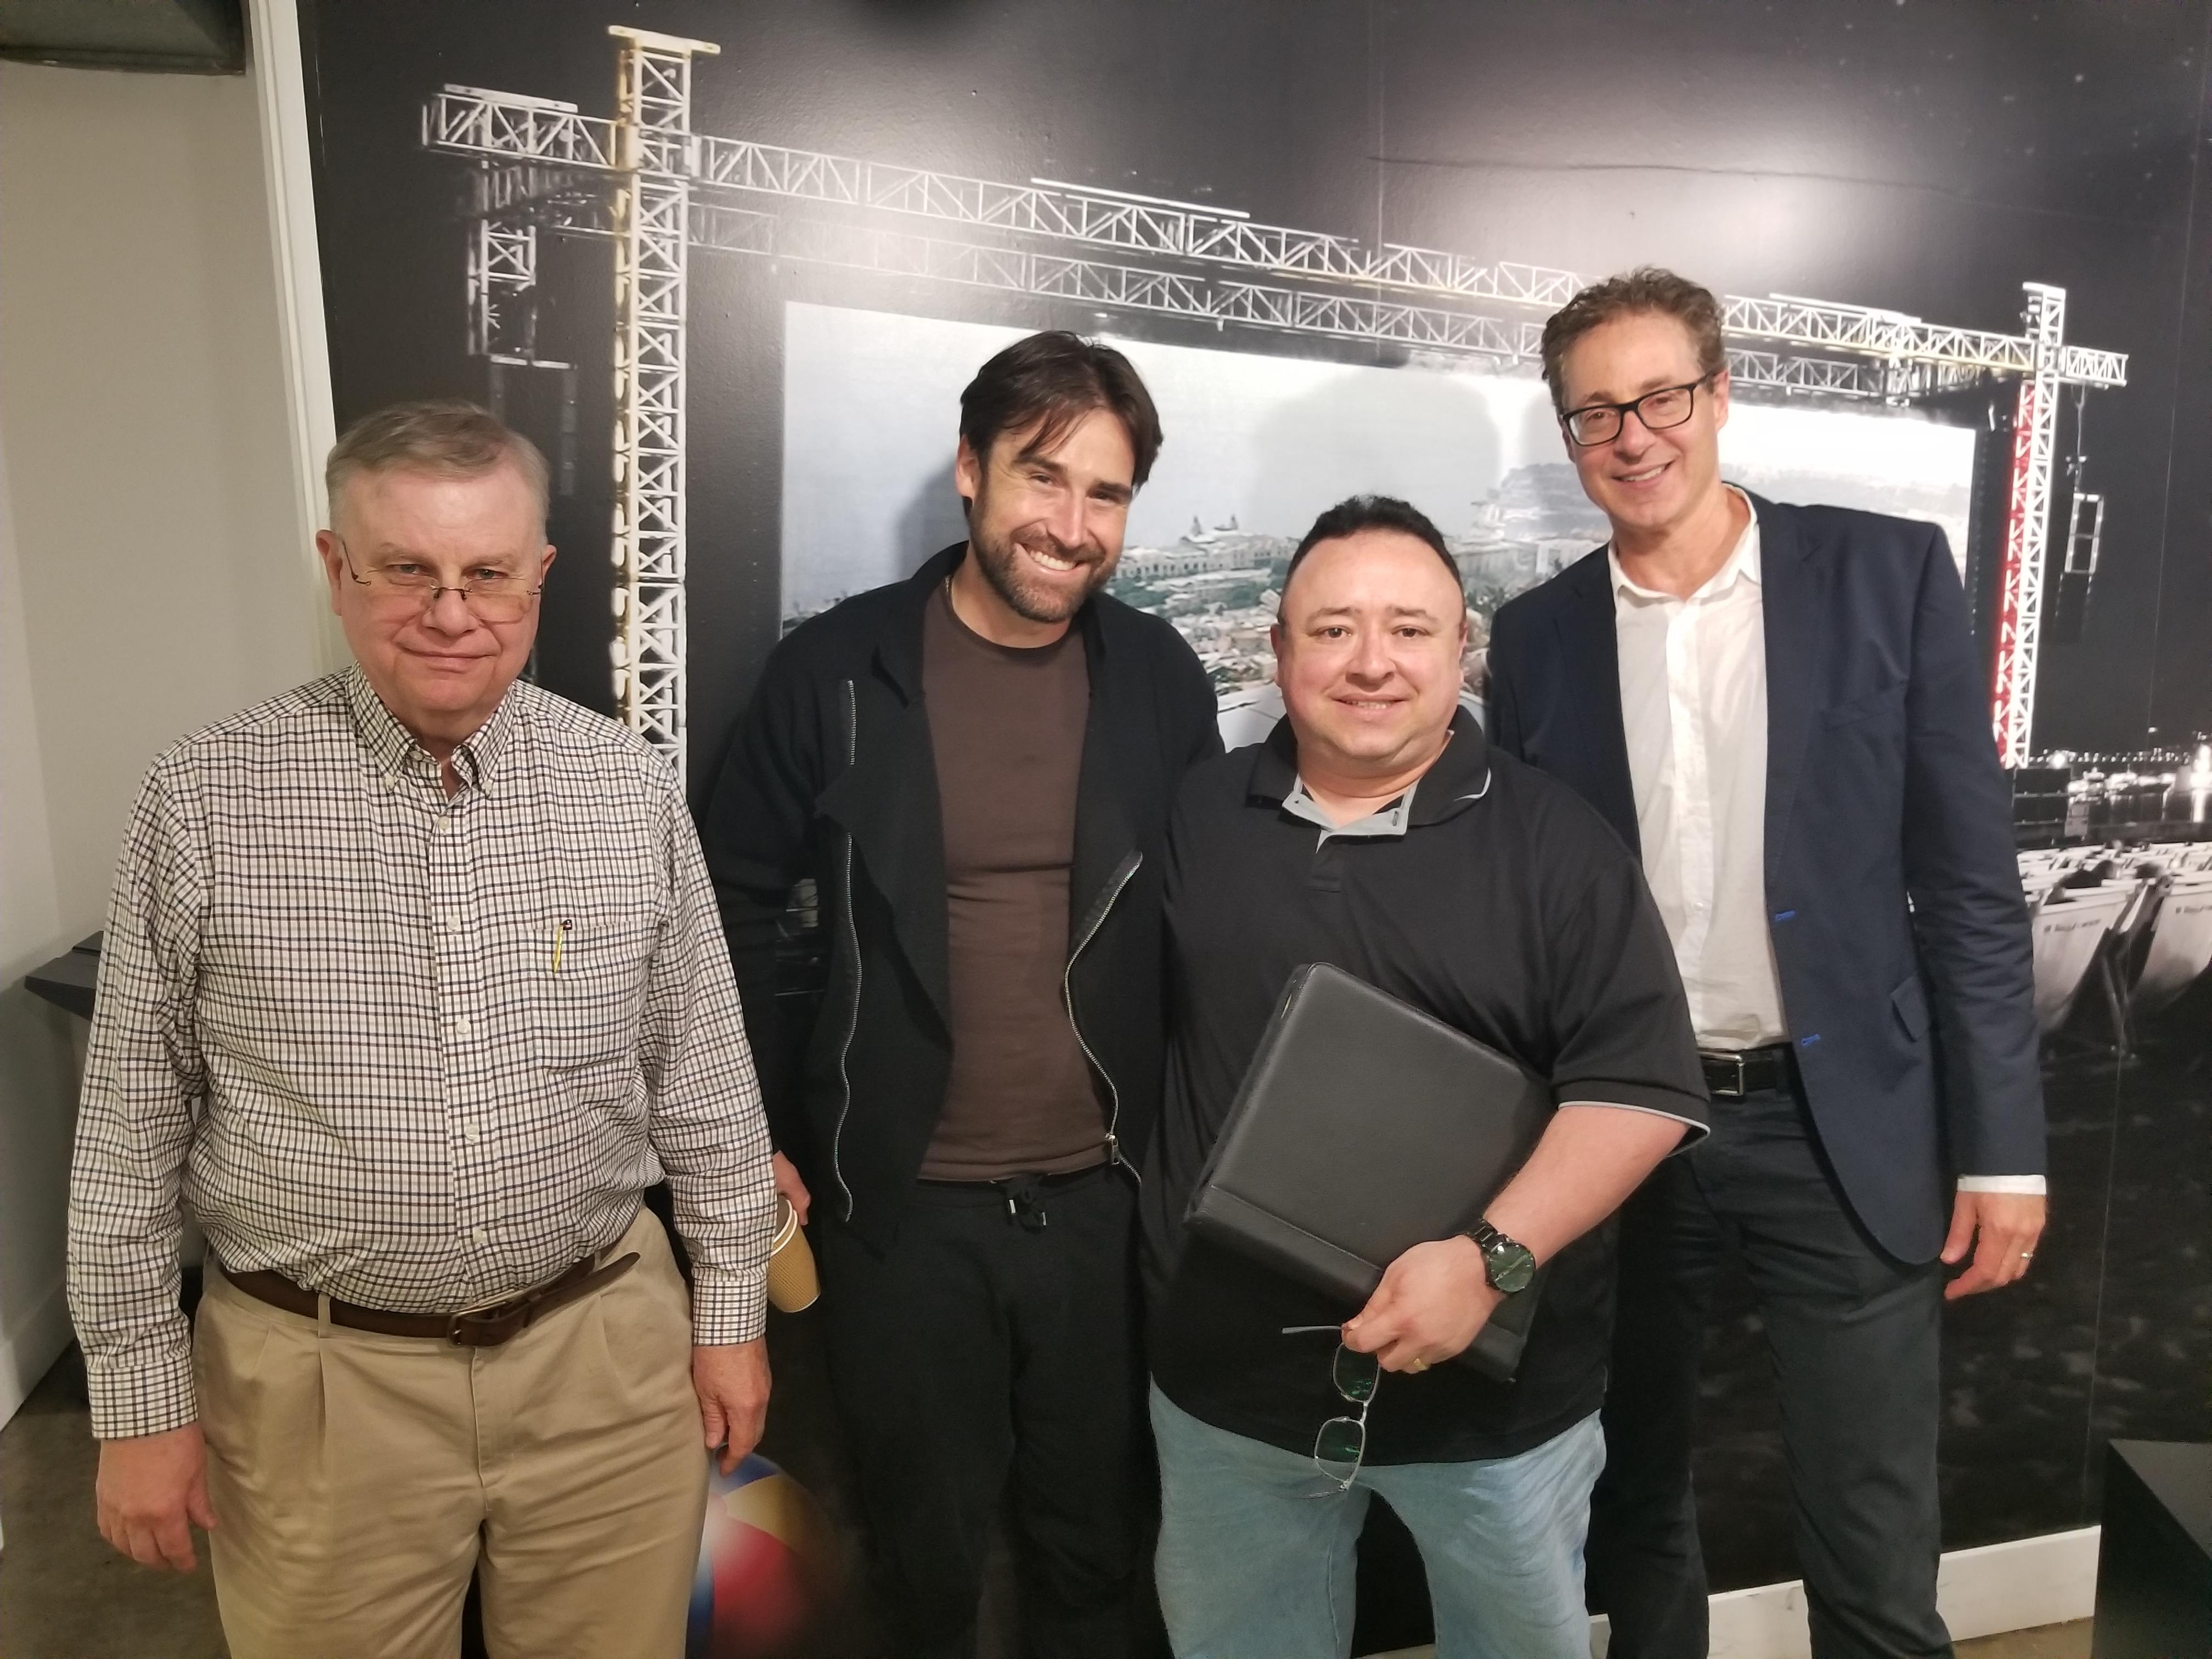 Whitley Strieber, Sean Stone, Gabe, Morris Ruksin.